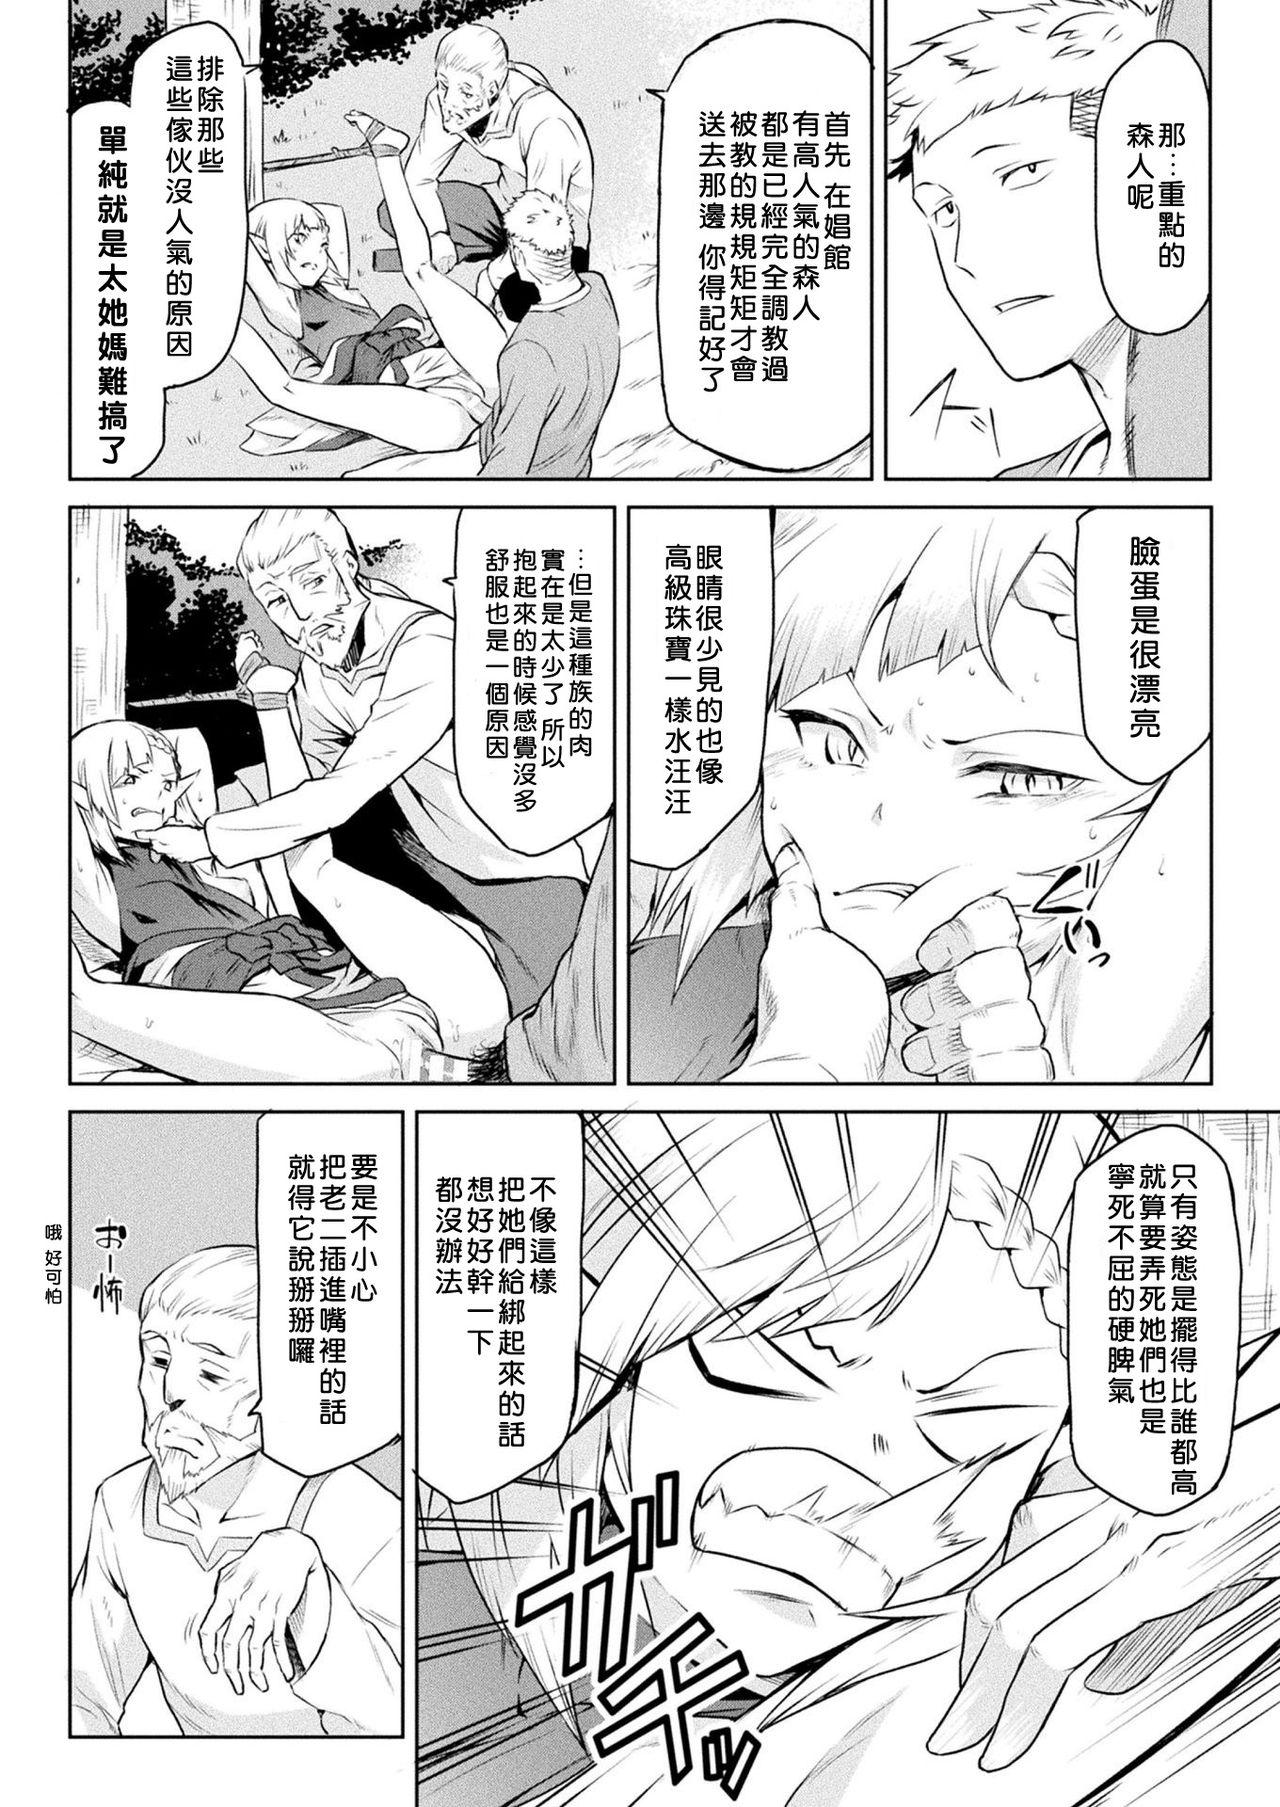 Kisei-jyu 41